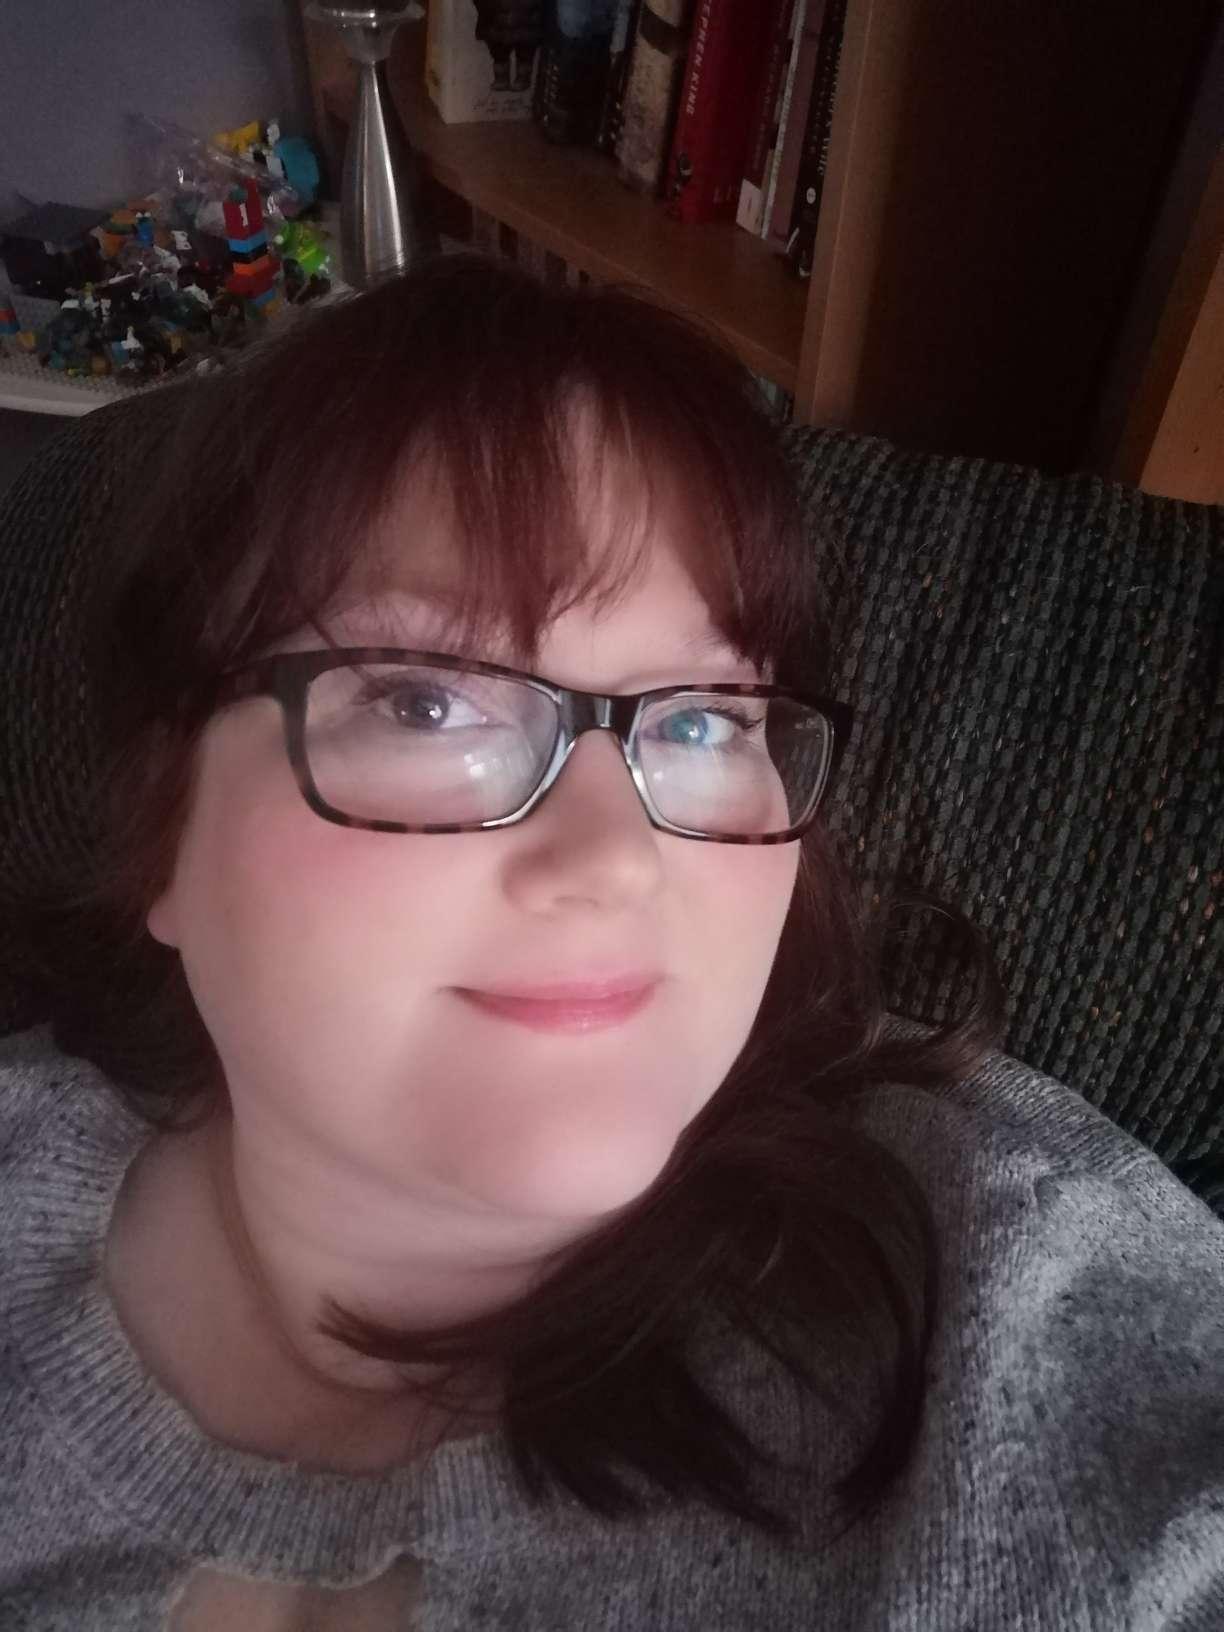 Siobhan 's profile image